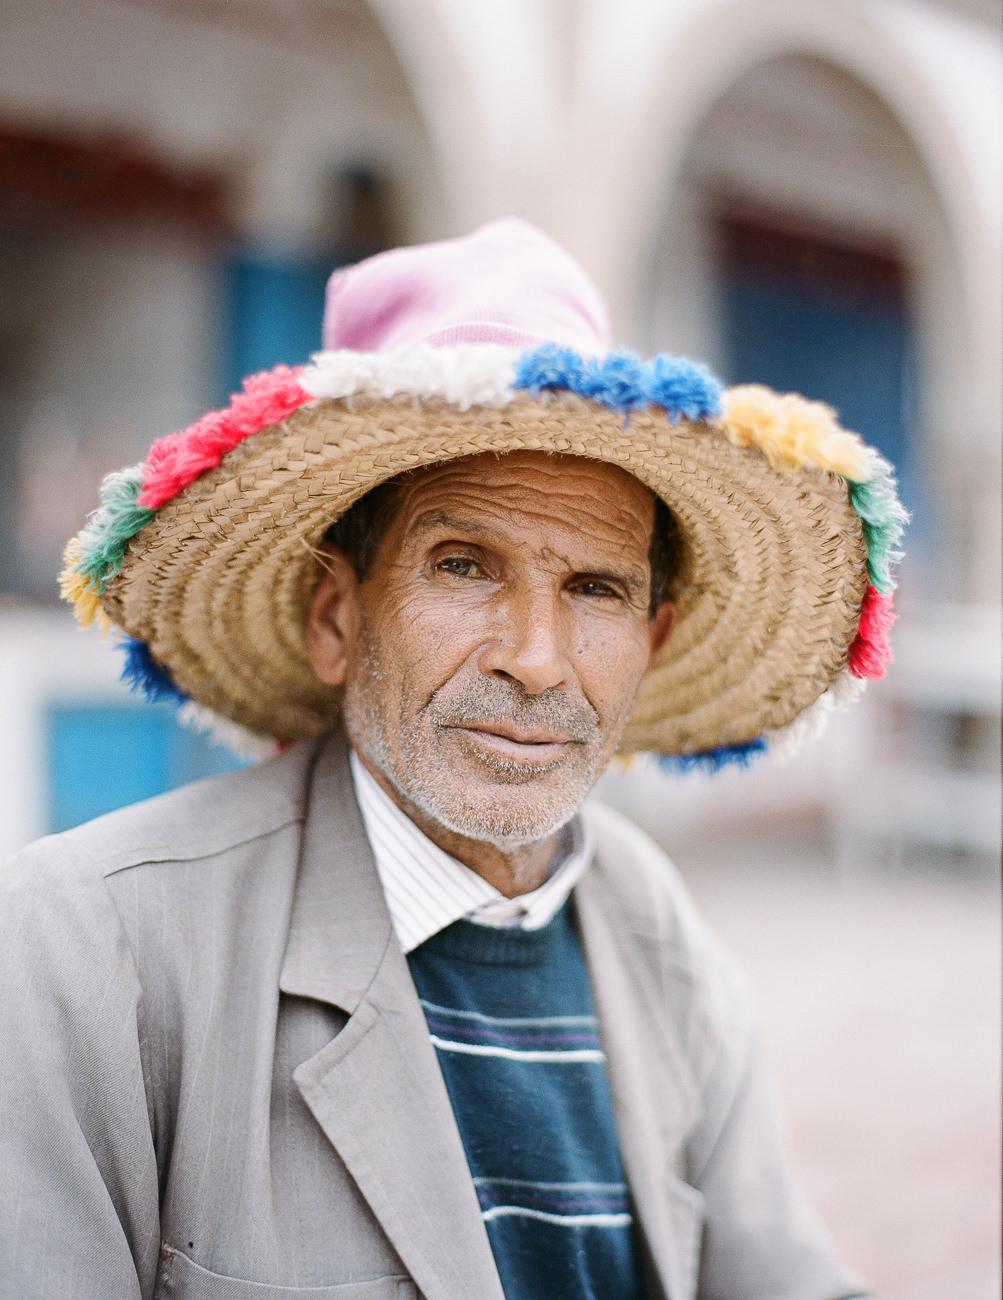 marrakech-photographe-voyage-alain-m-8.jpg